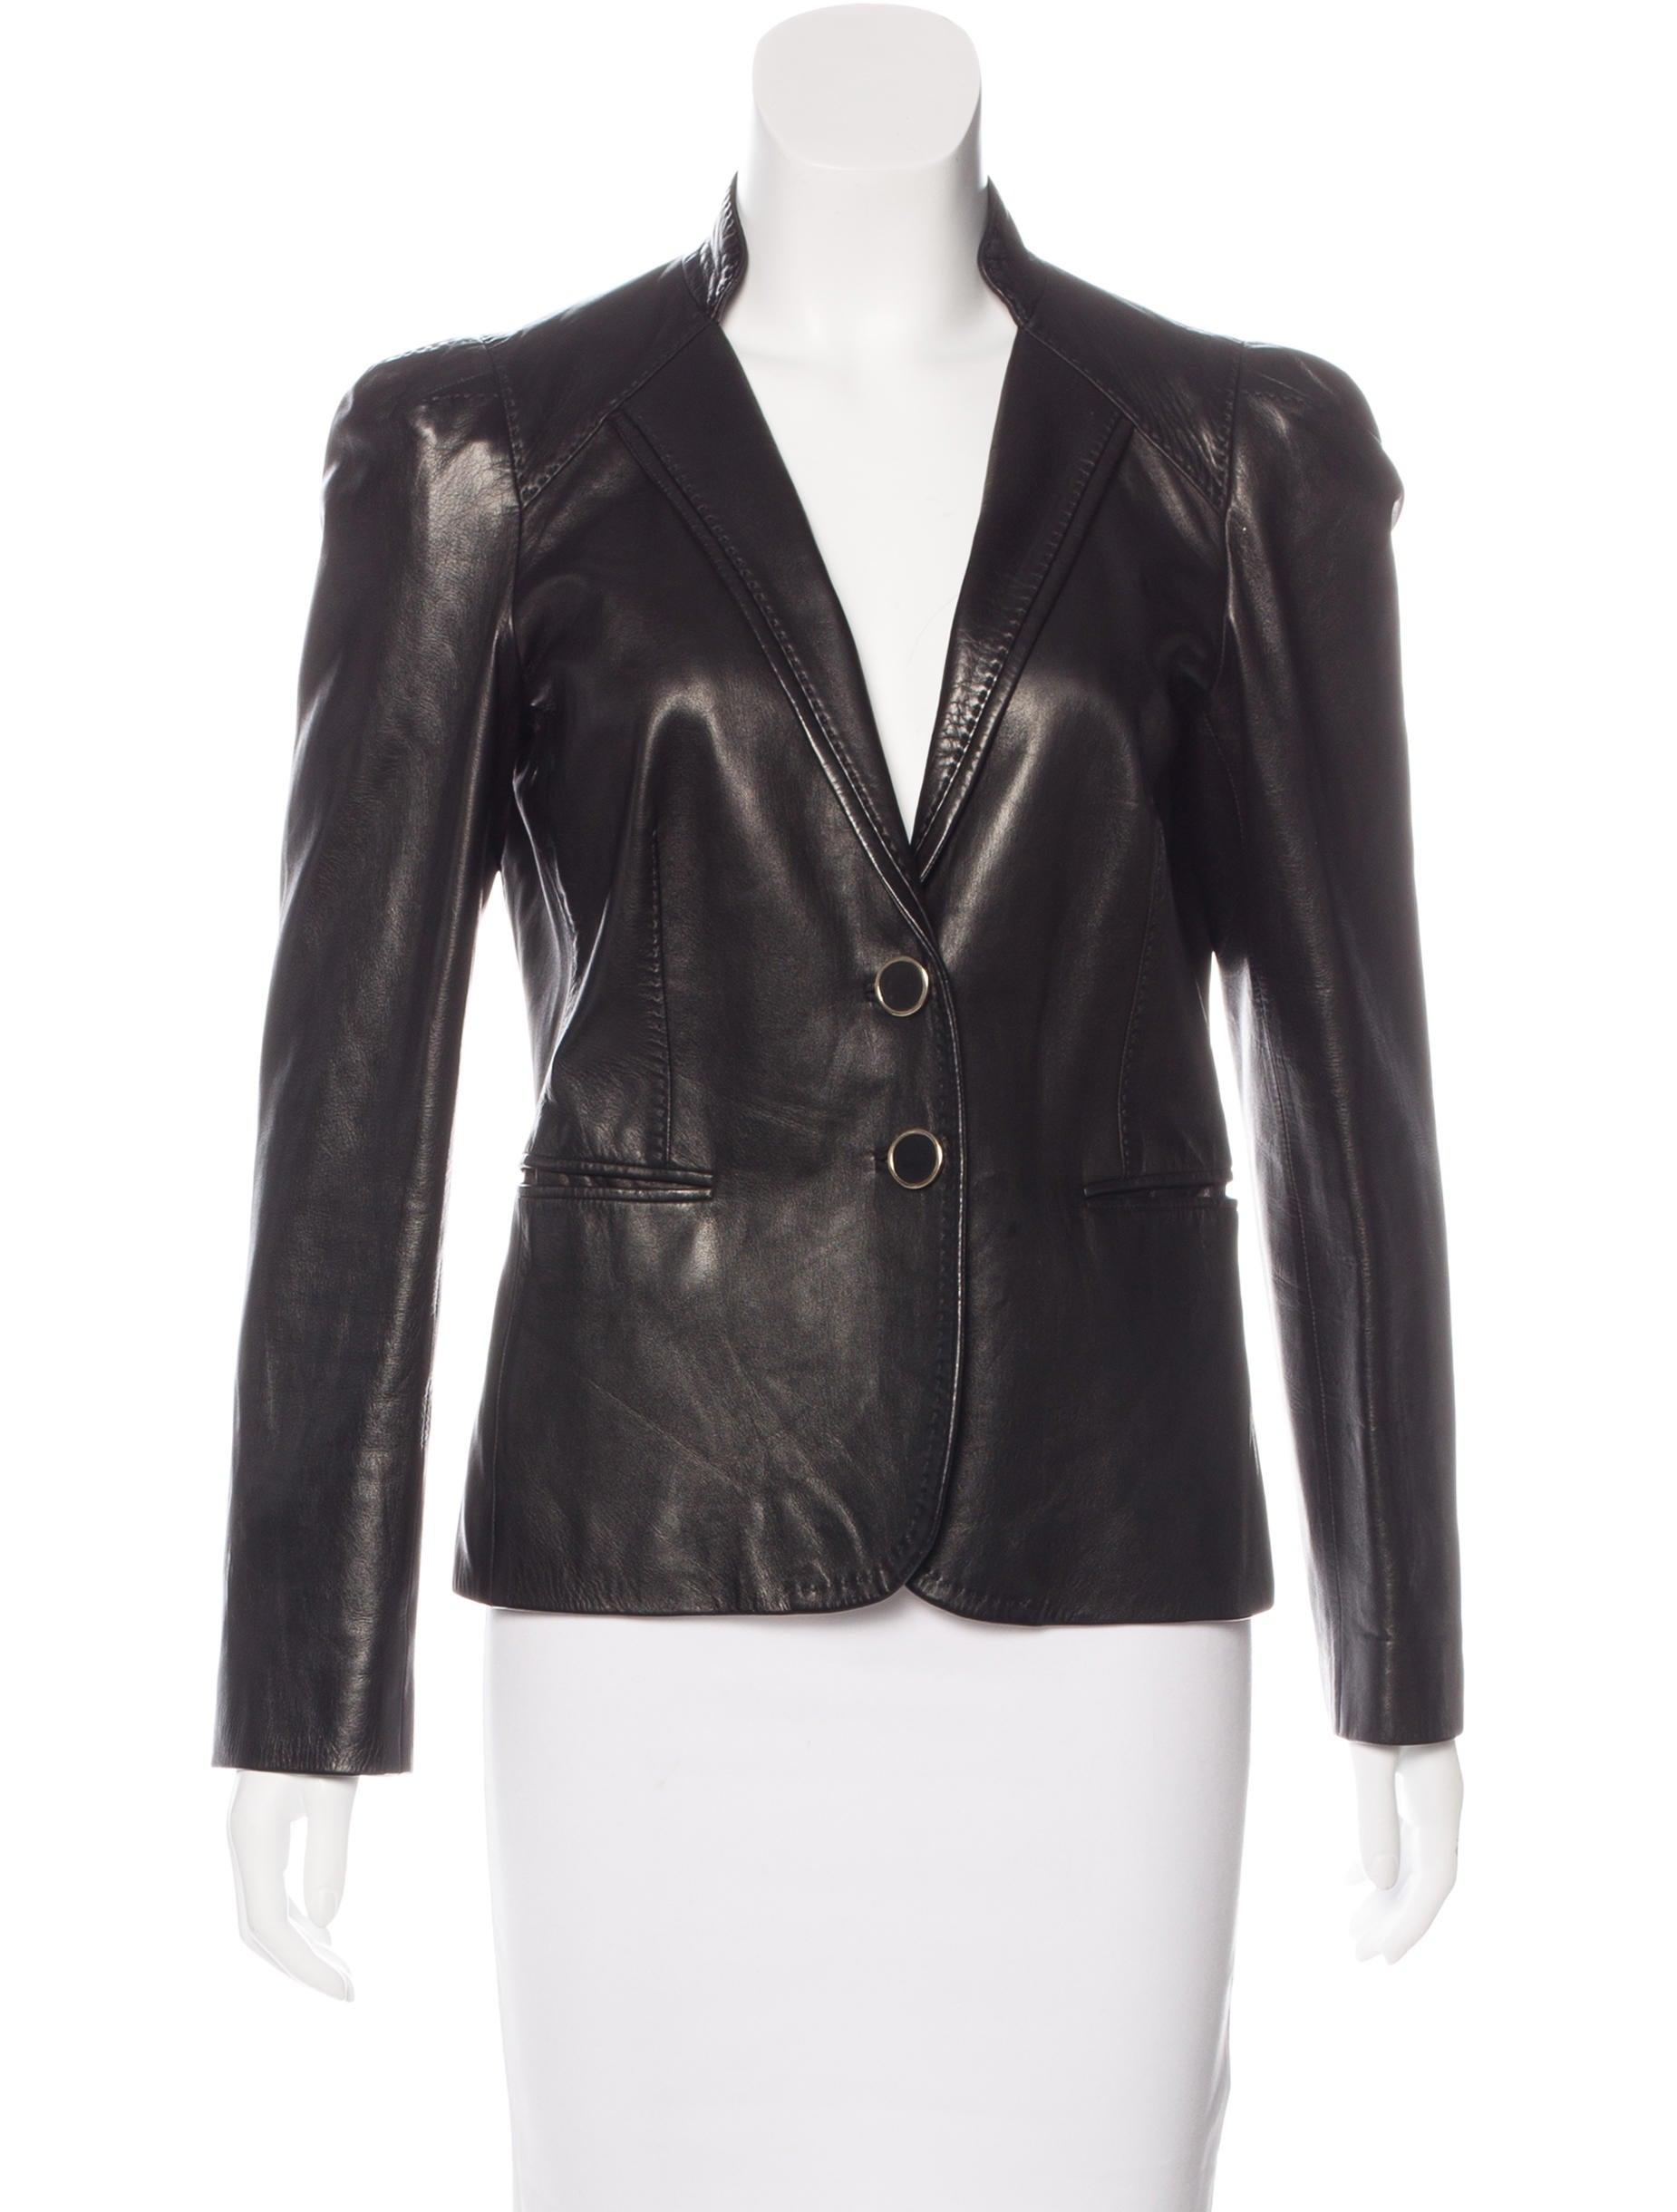 Gucci Leather Long Sleeve Jacket - Clothing